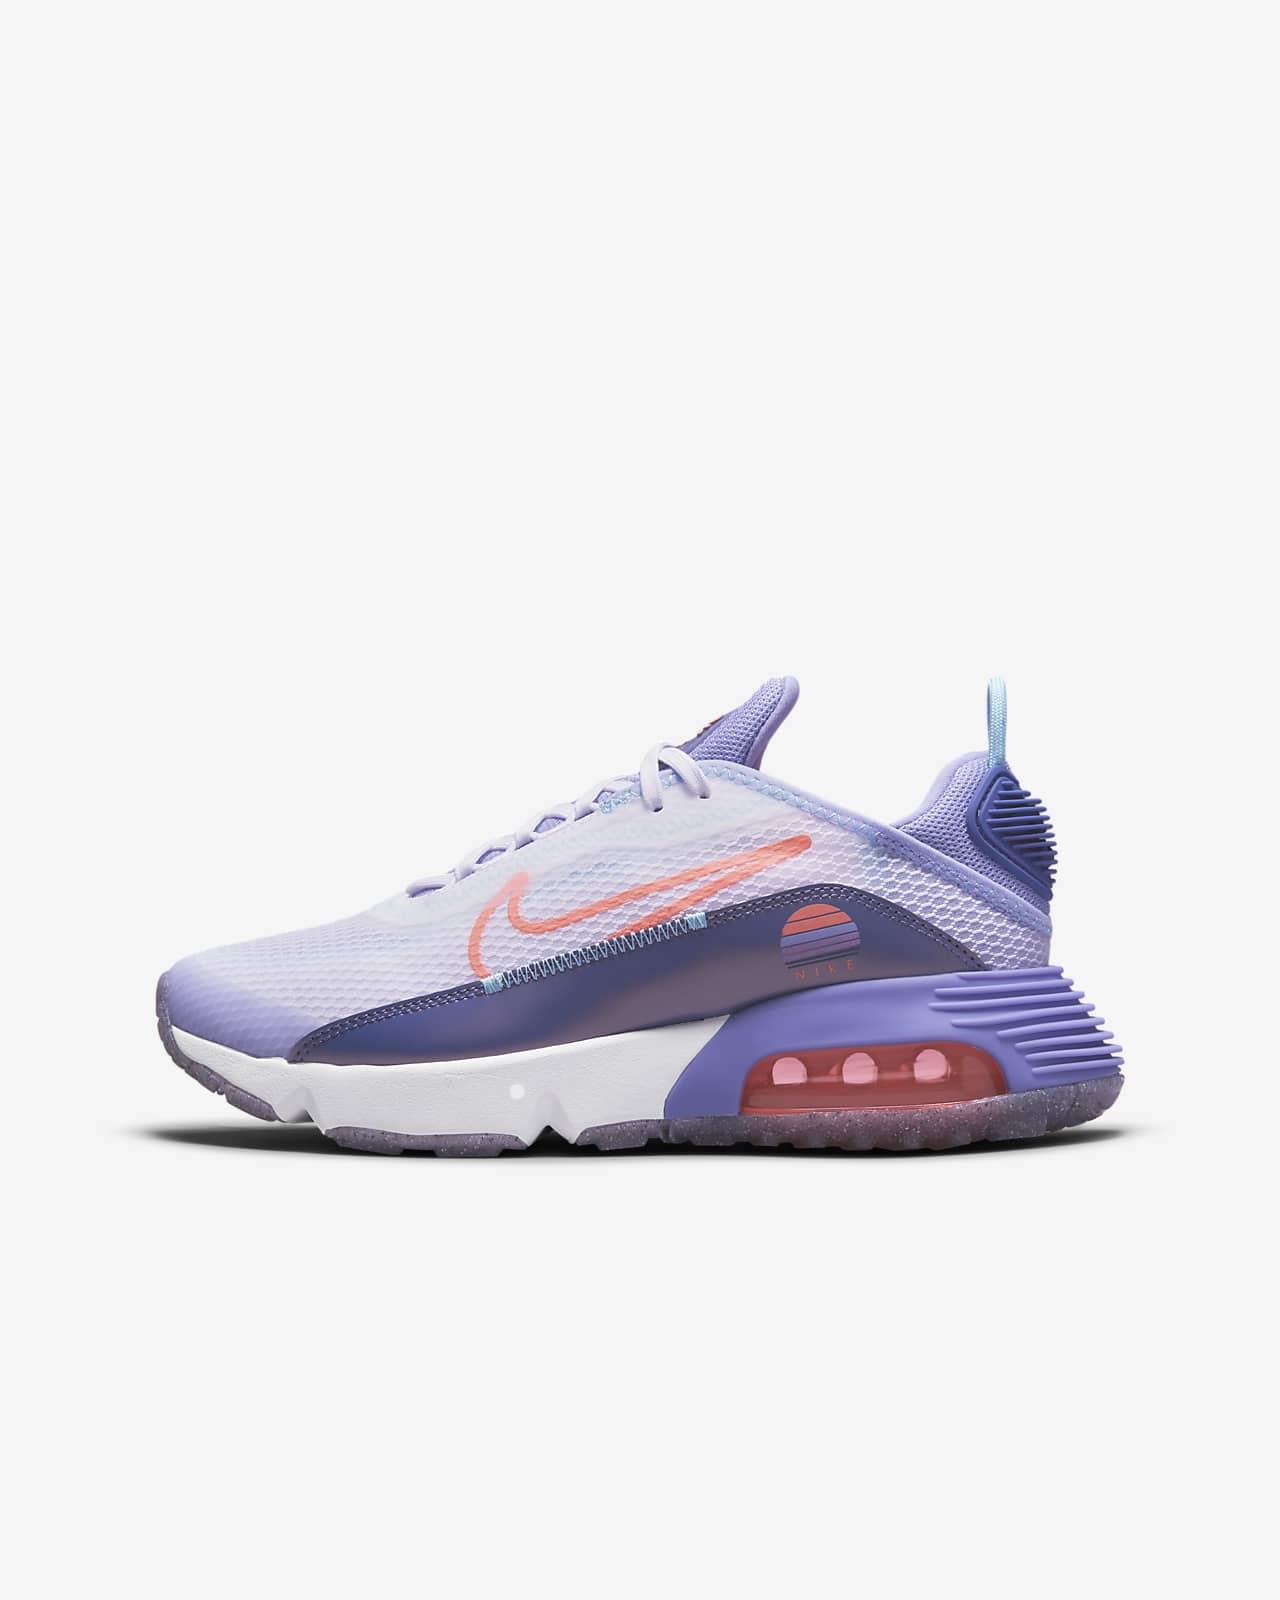 Nike Air Max 2090 SE 2 (GS) 大童运动童鞋